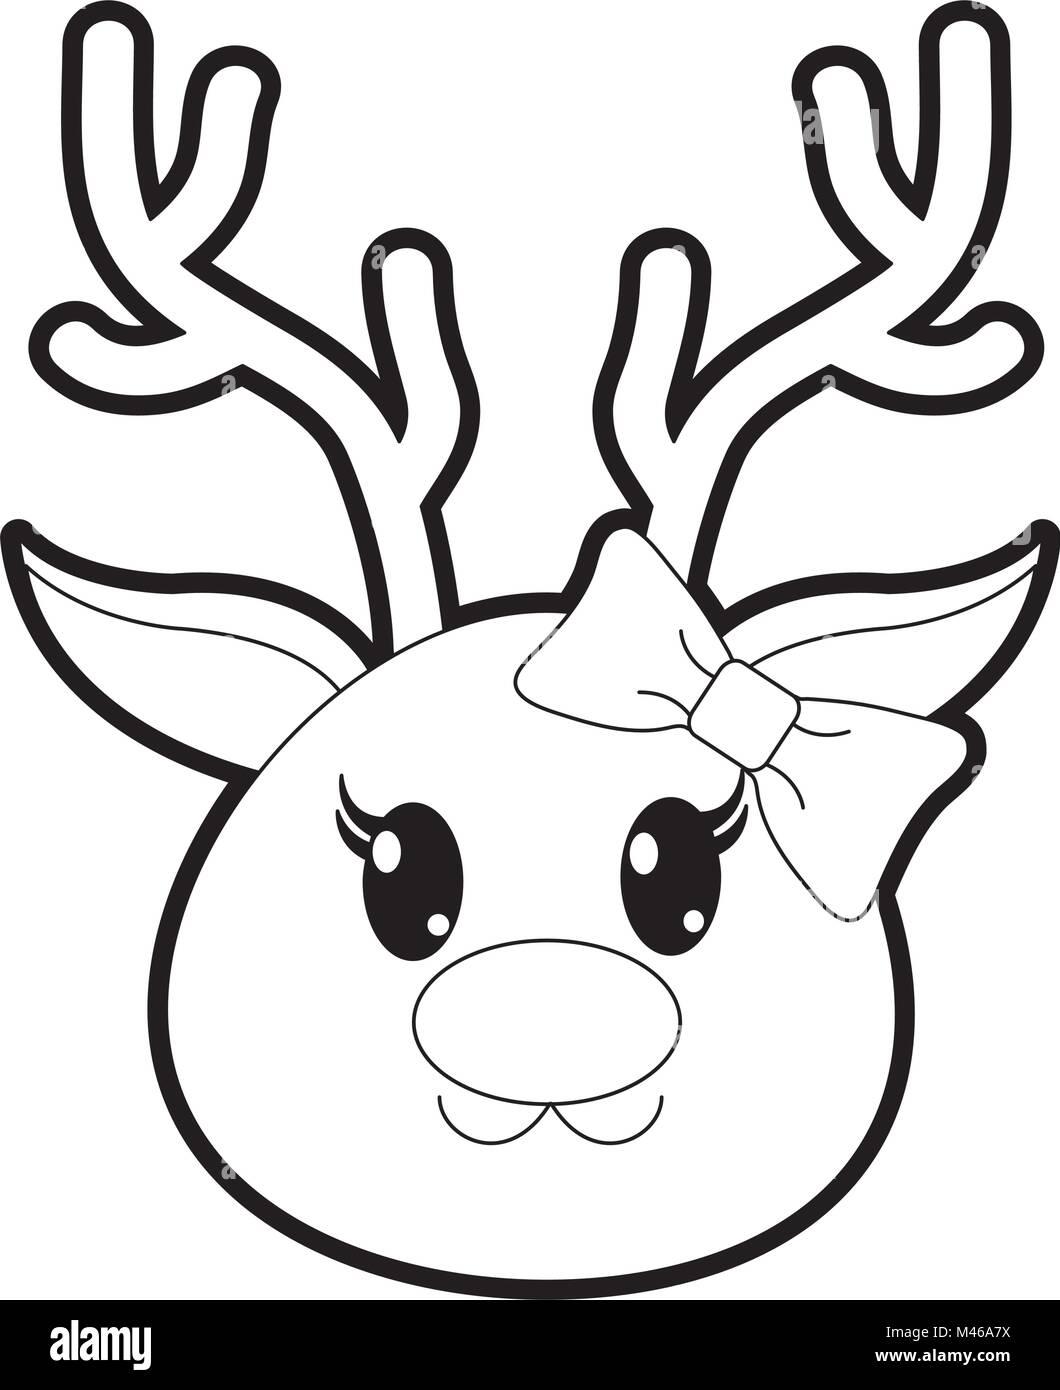 outline female reindeer head cute animal stock vector art